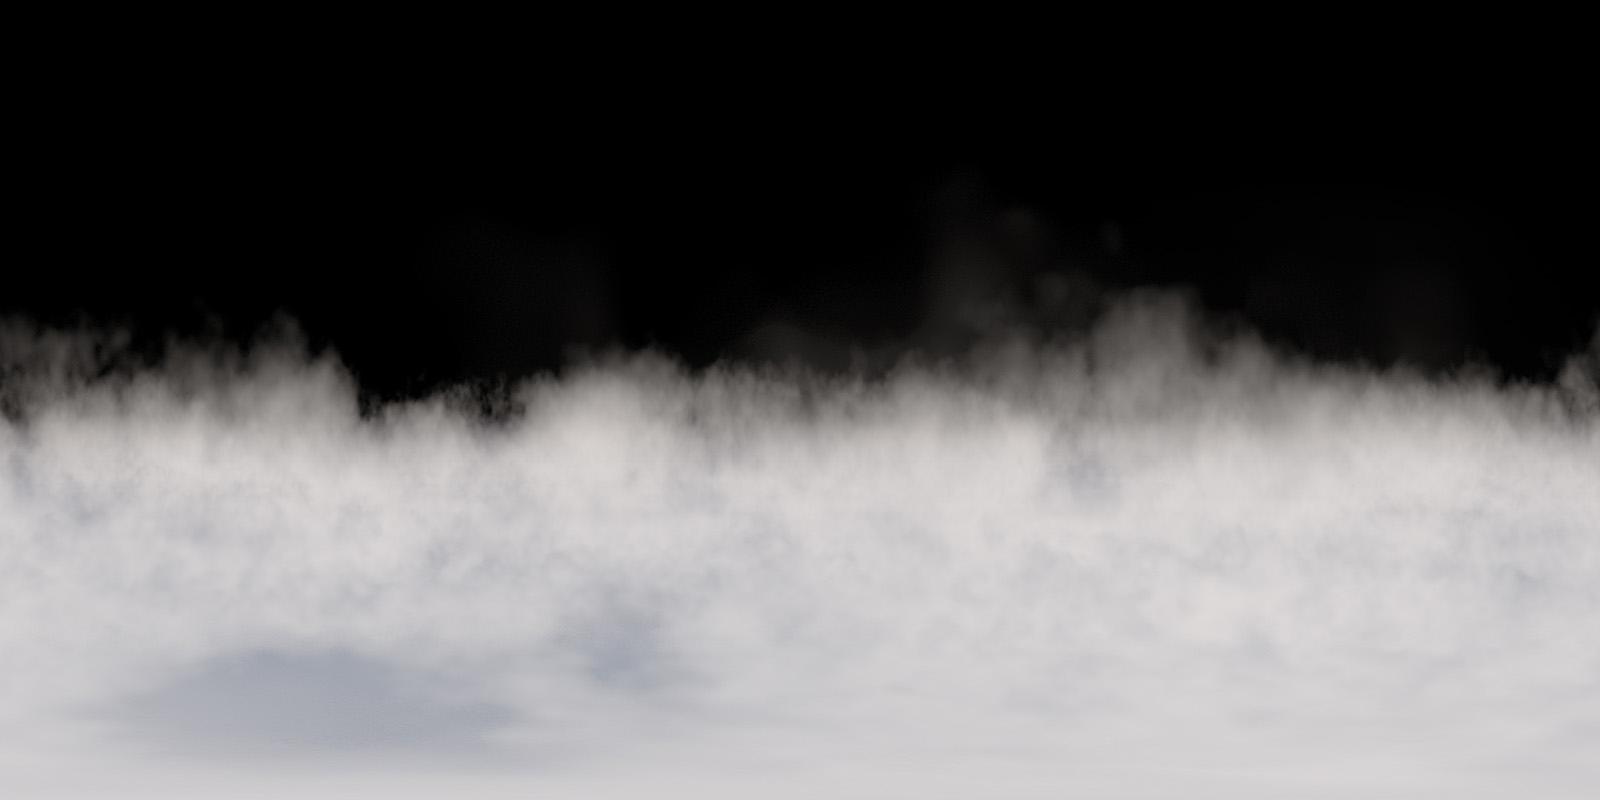 360 VR Ground Fog 3601 Stock Video